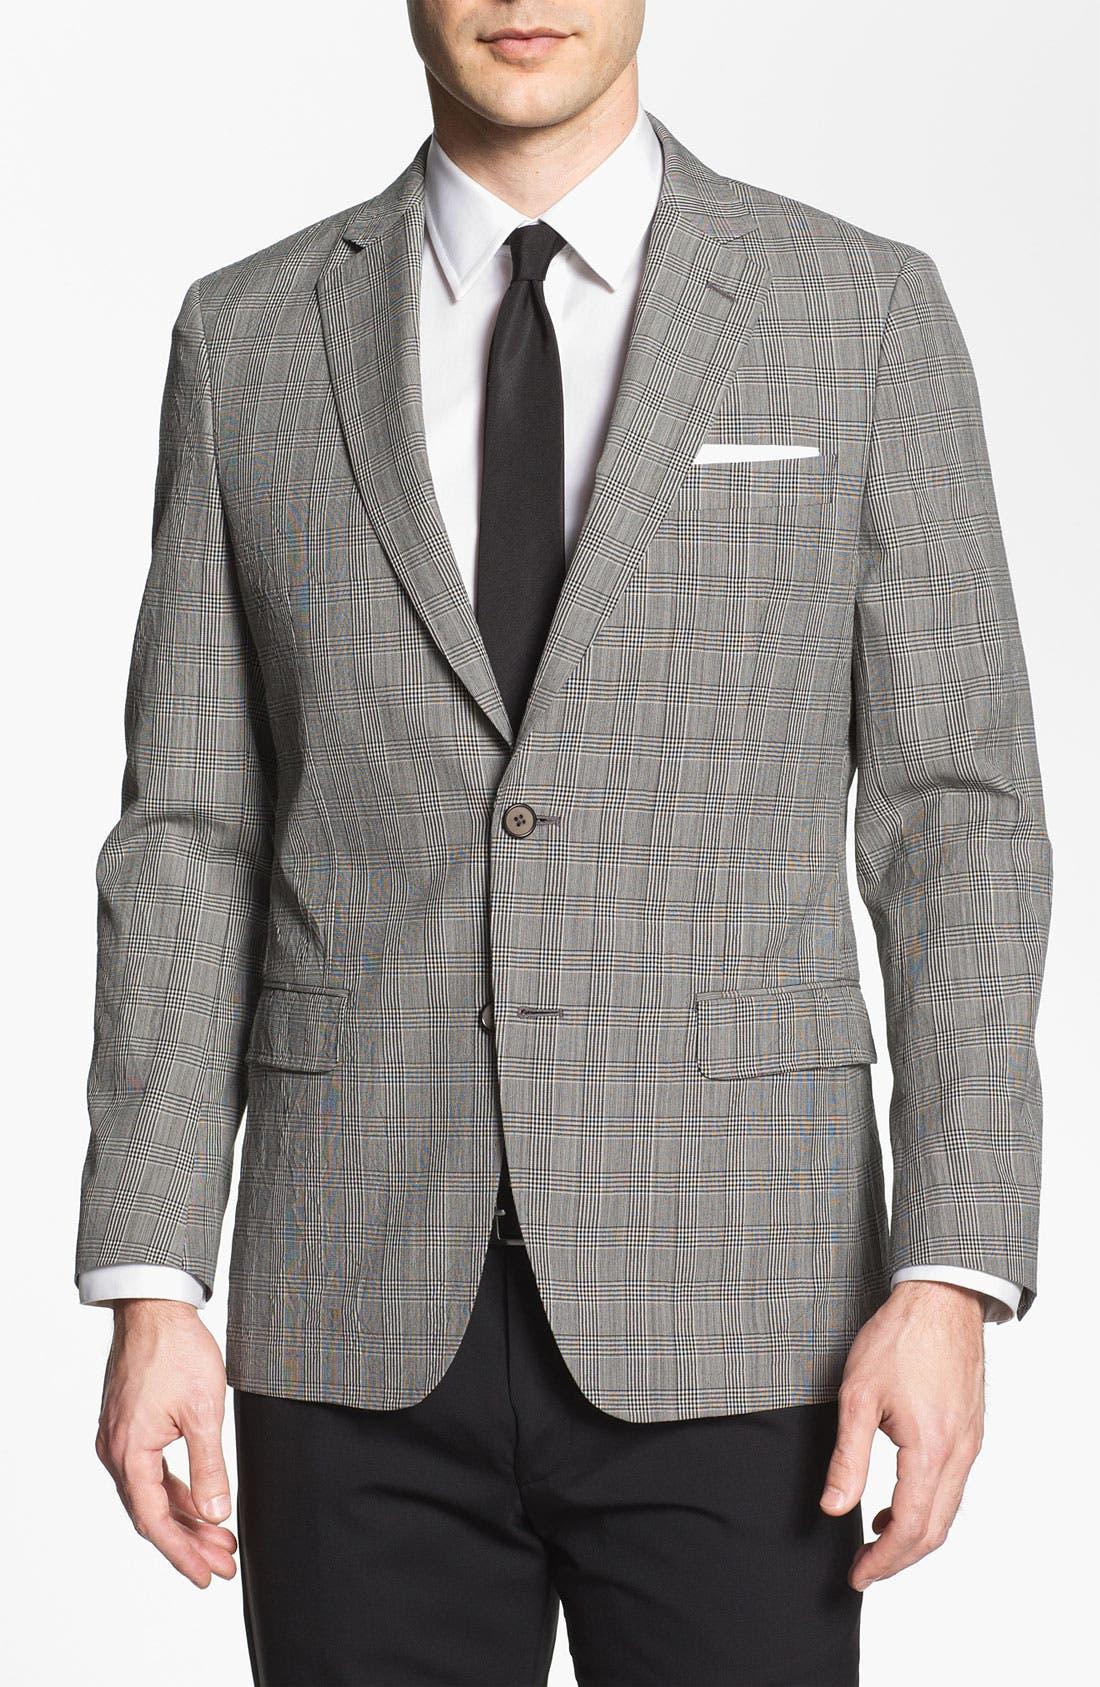 Main Image - Michael Kors Trim Fit Plaid Wool Sportcoat